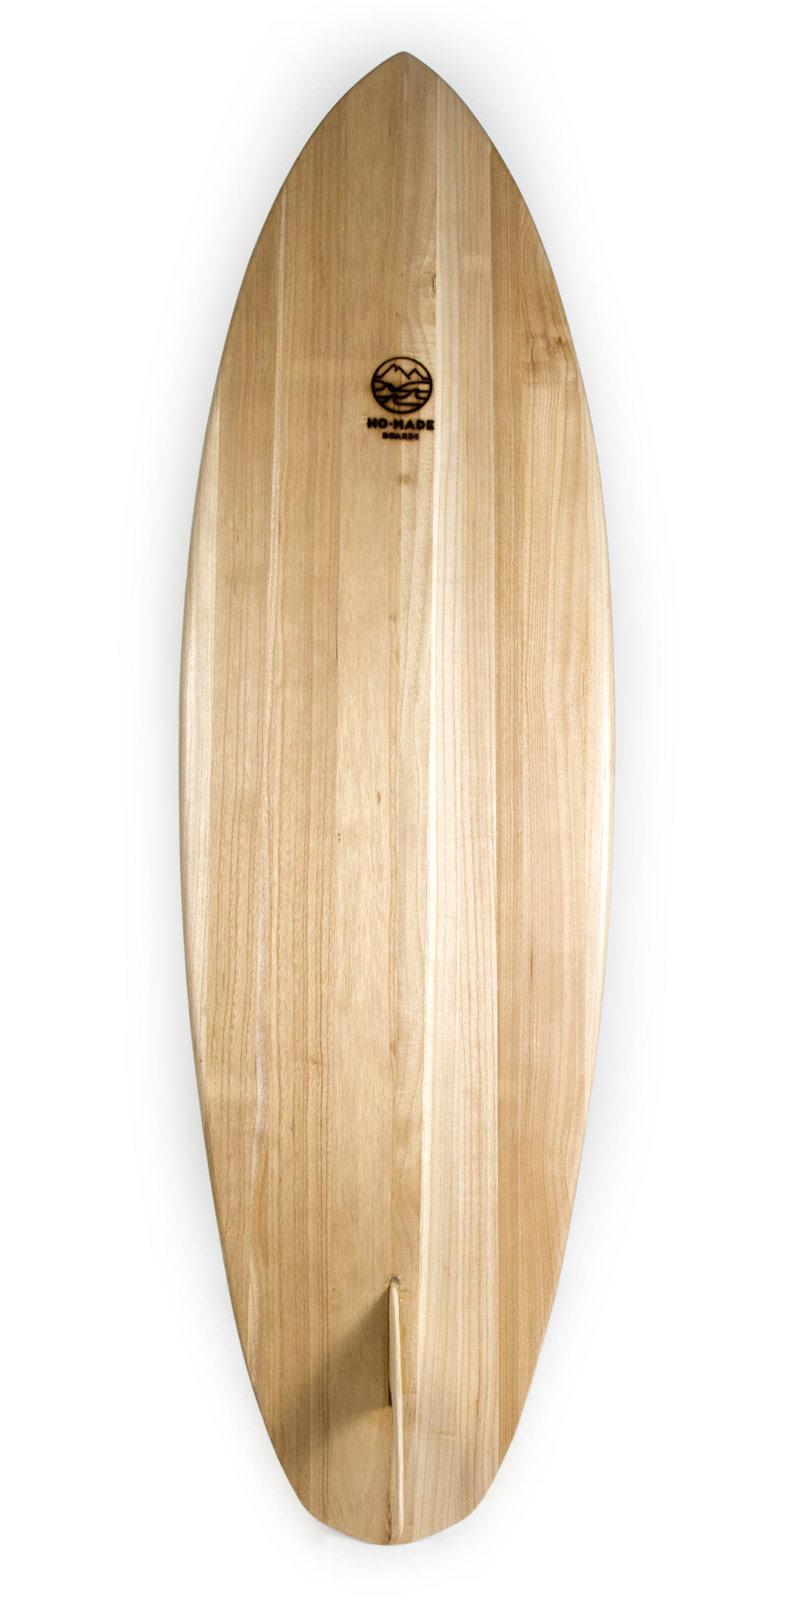 kharma wooden surfboard